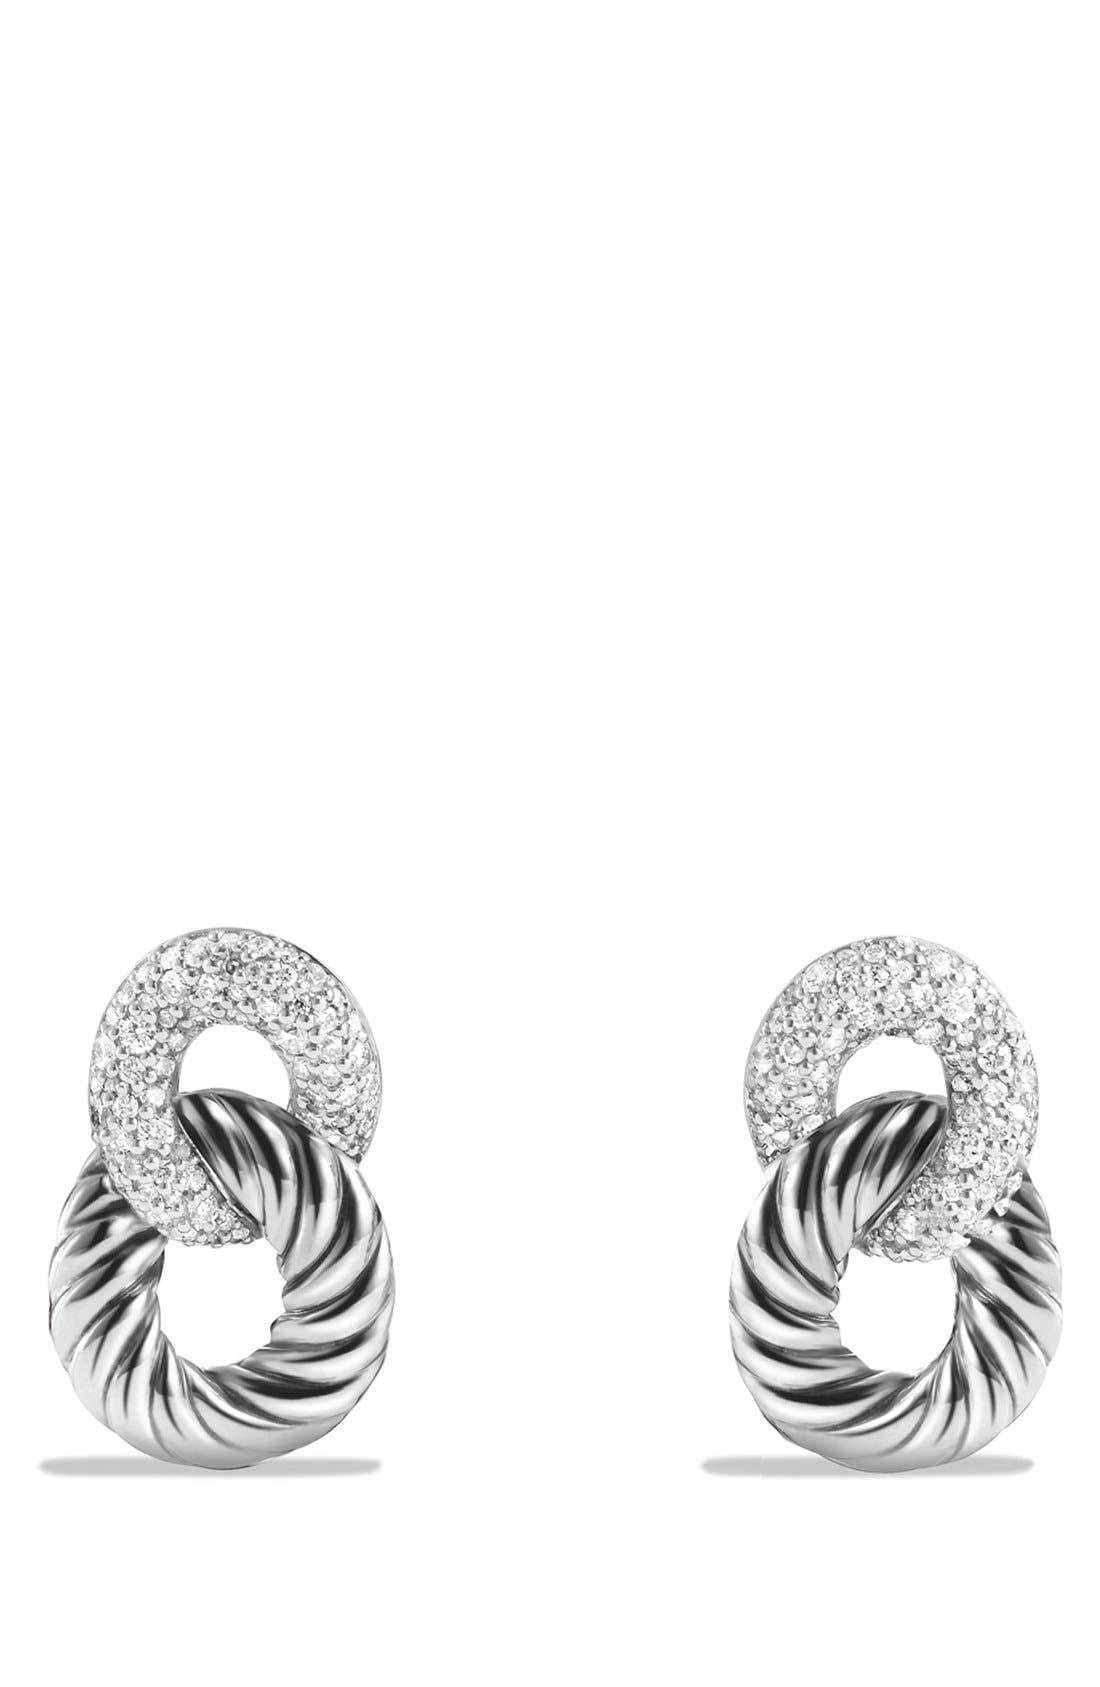 Alternate Image 1 Selected - David Yurman'Belmont Curb Link' Drop Earrings with Diamonds